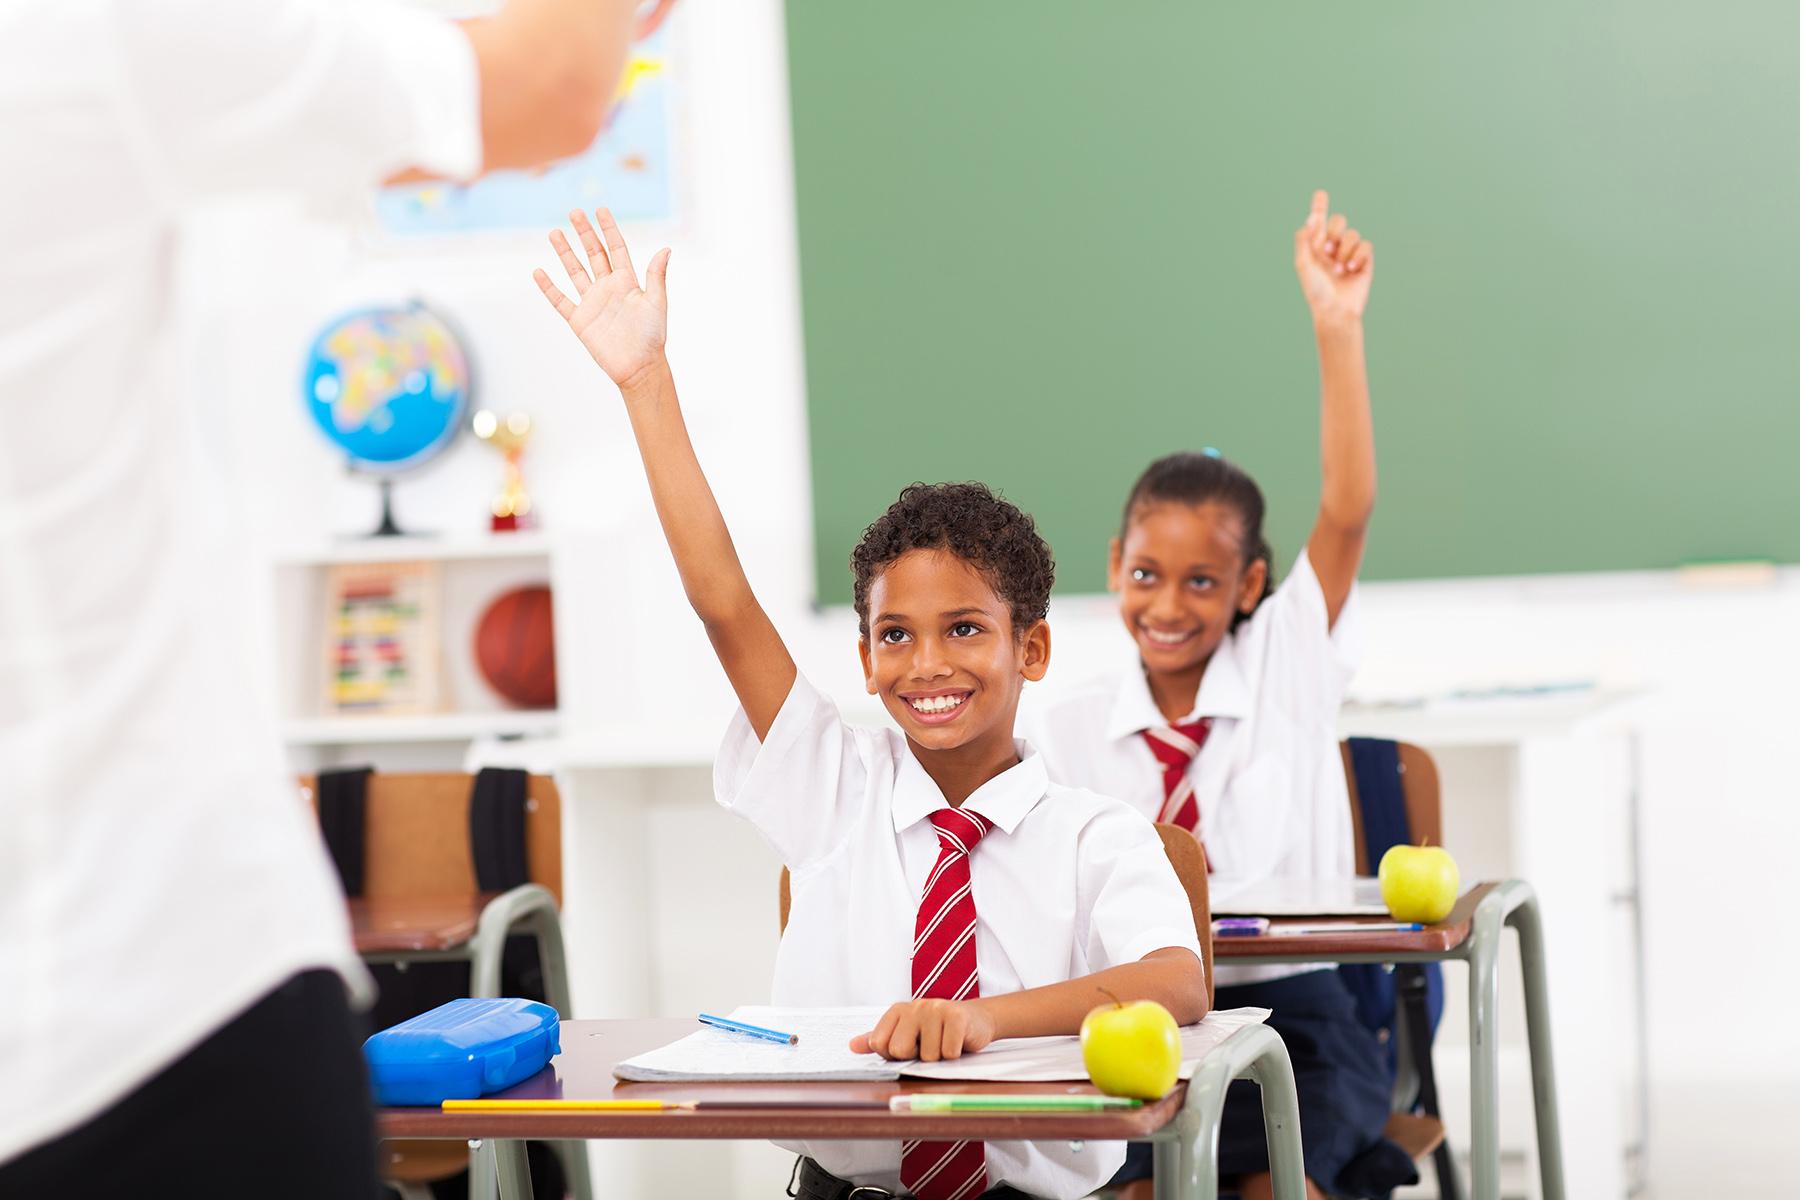 Children in uniform raising their hands for the teacher